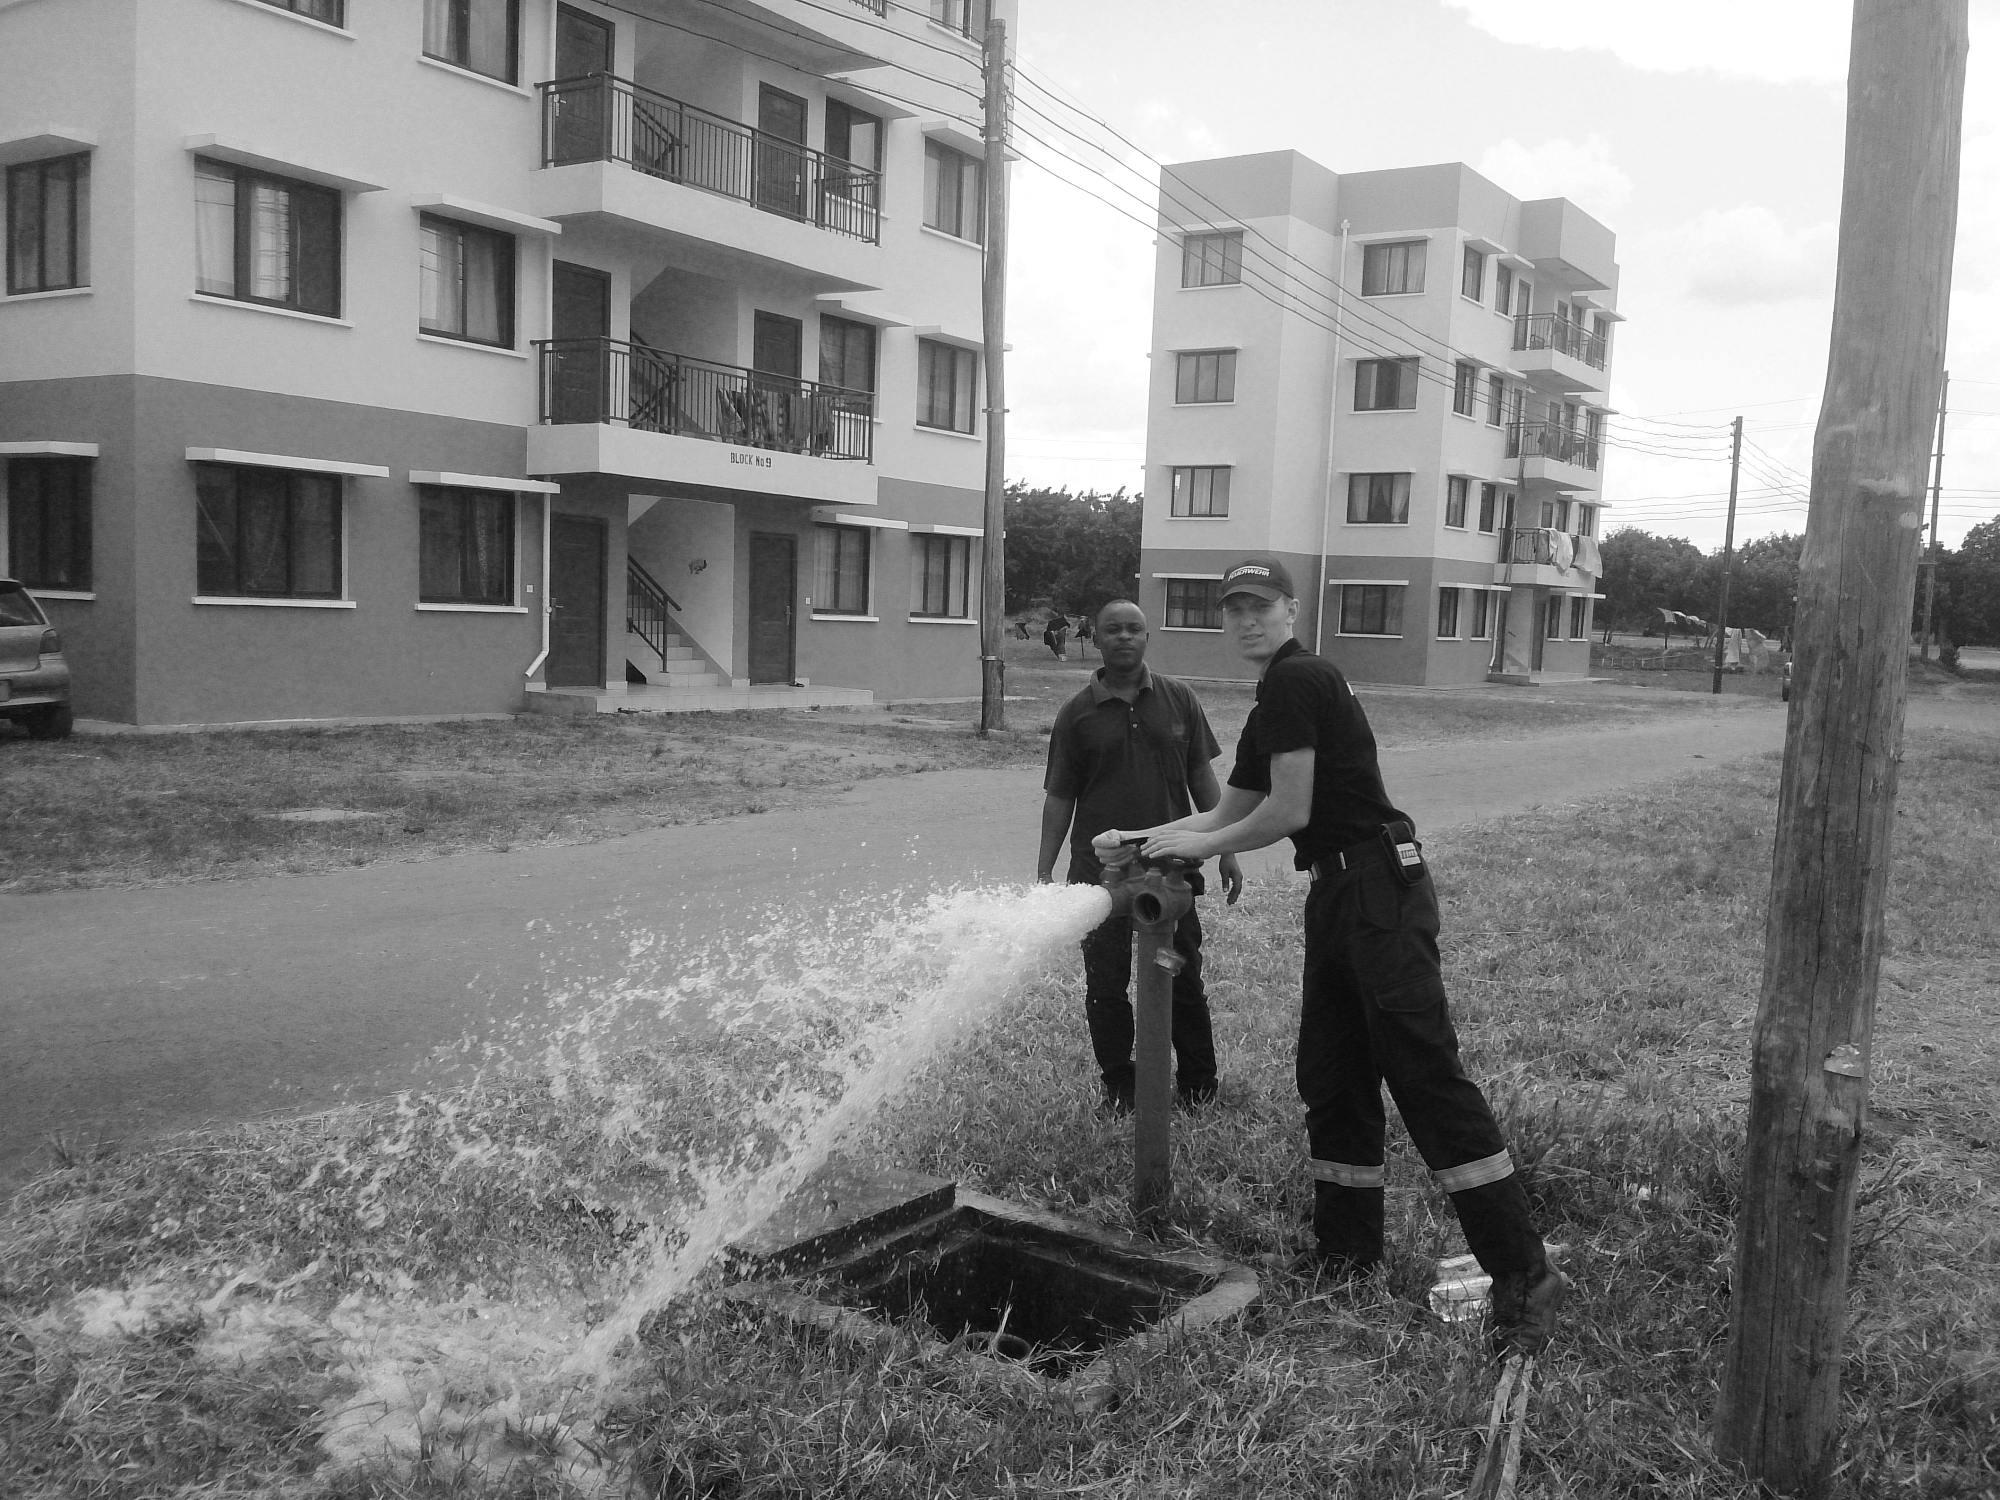 Testing Fire Hydrant